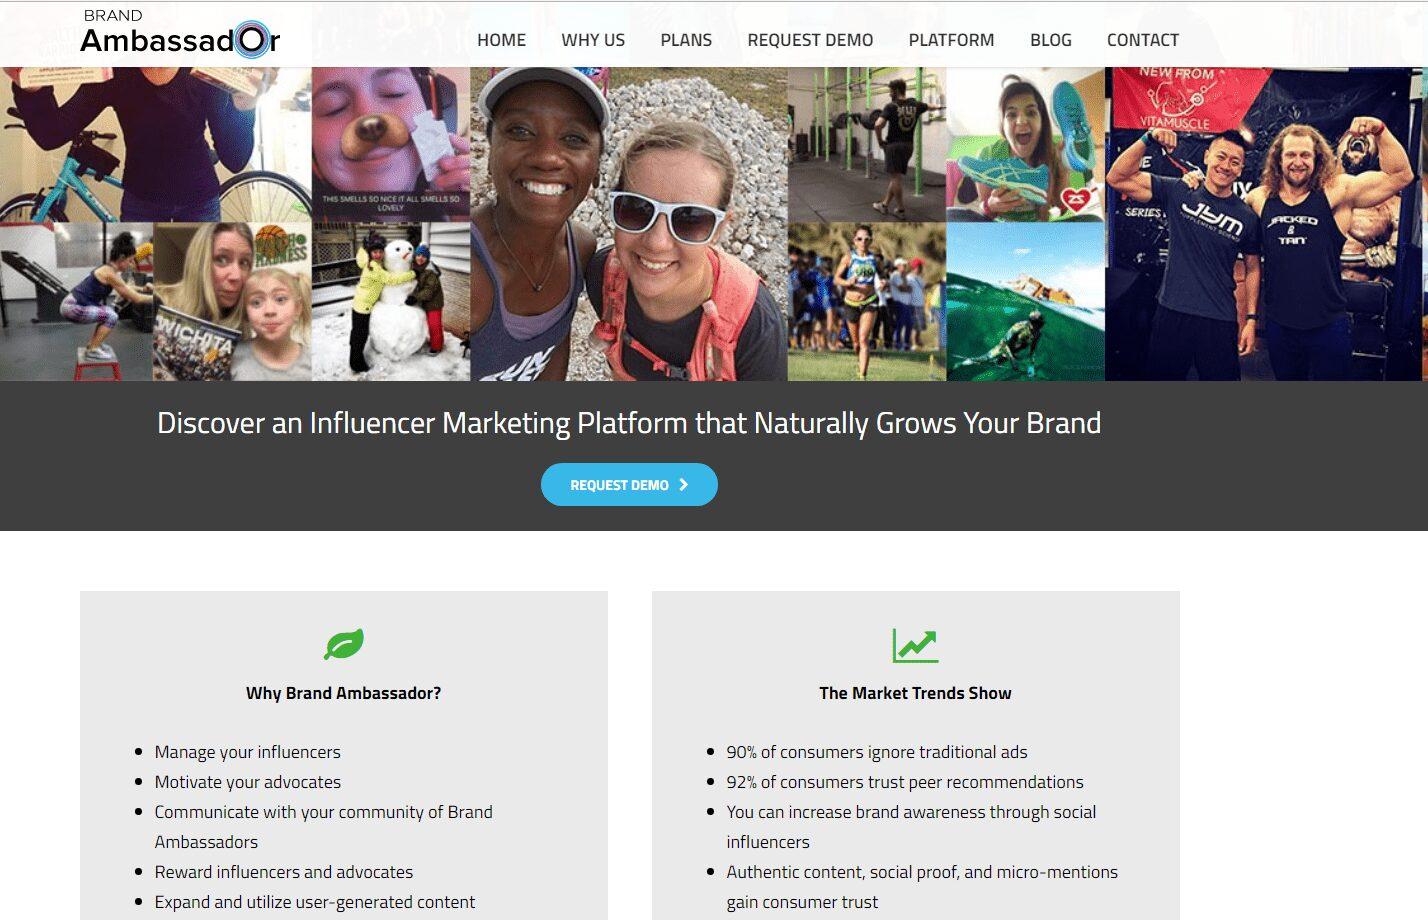 Product Showcase: Ambassadeur de la marque